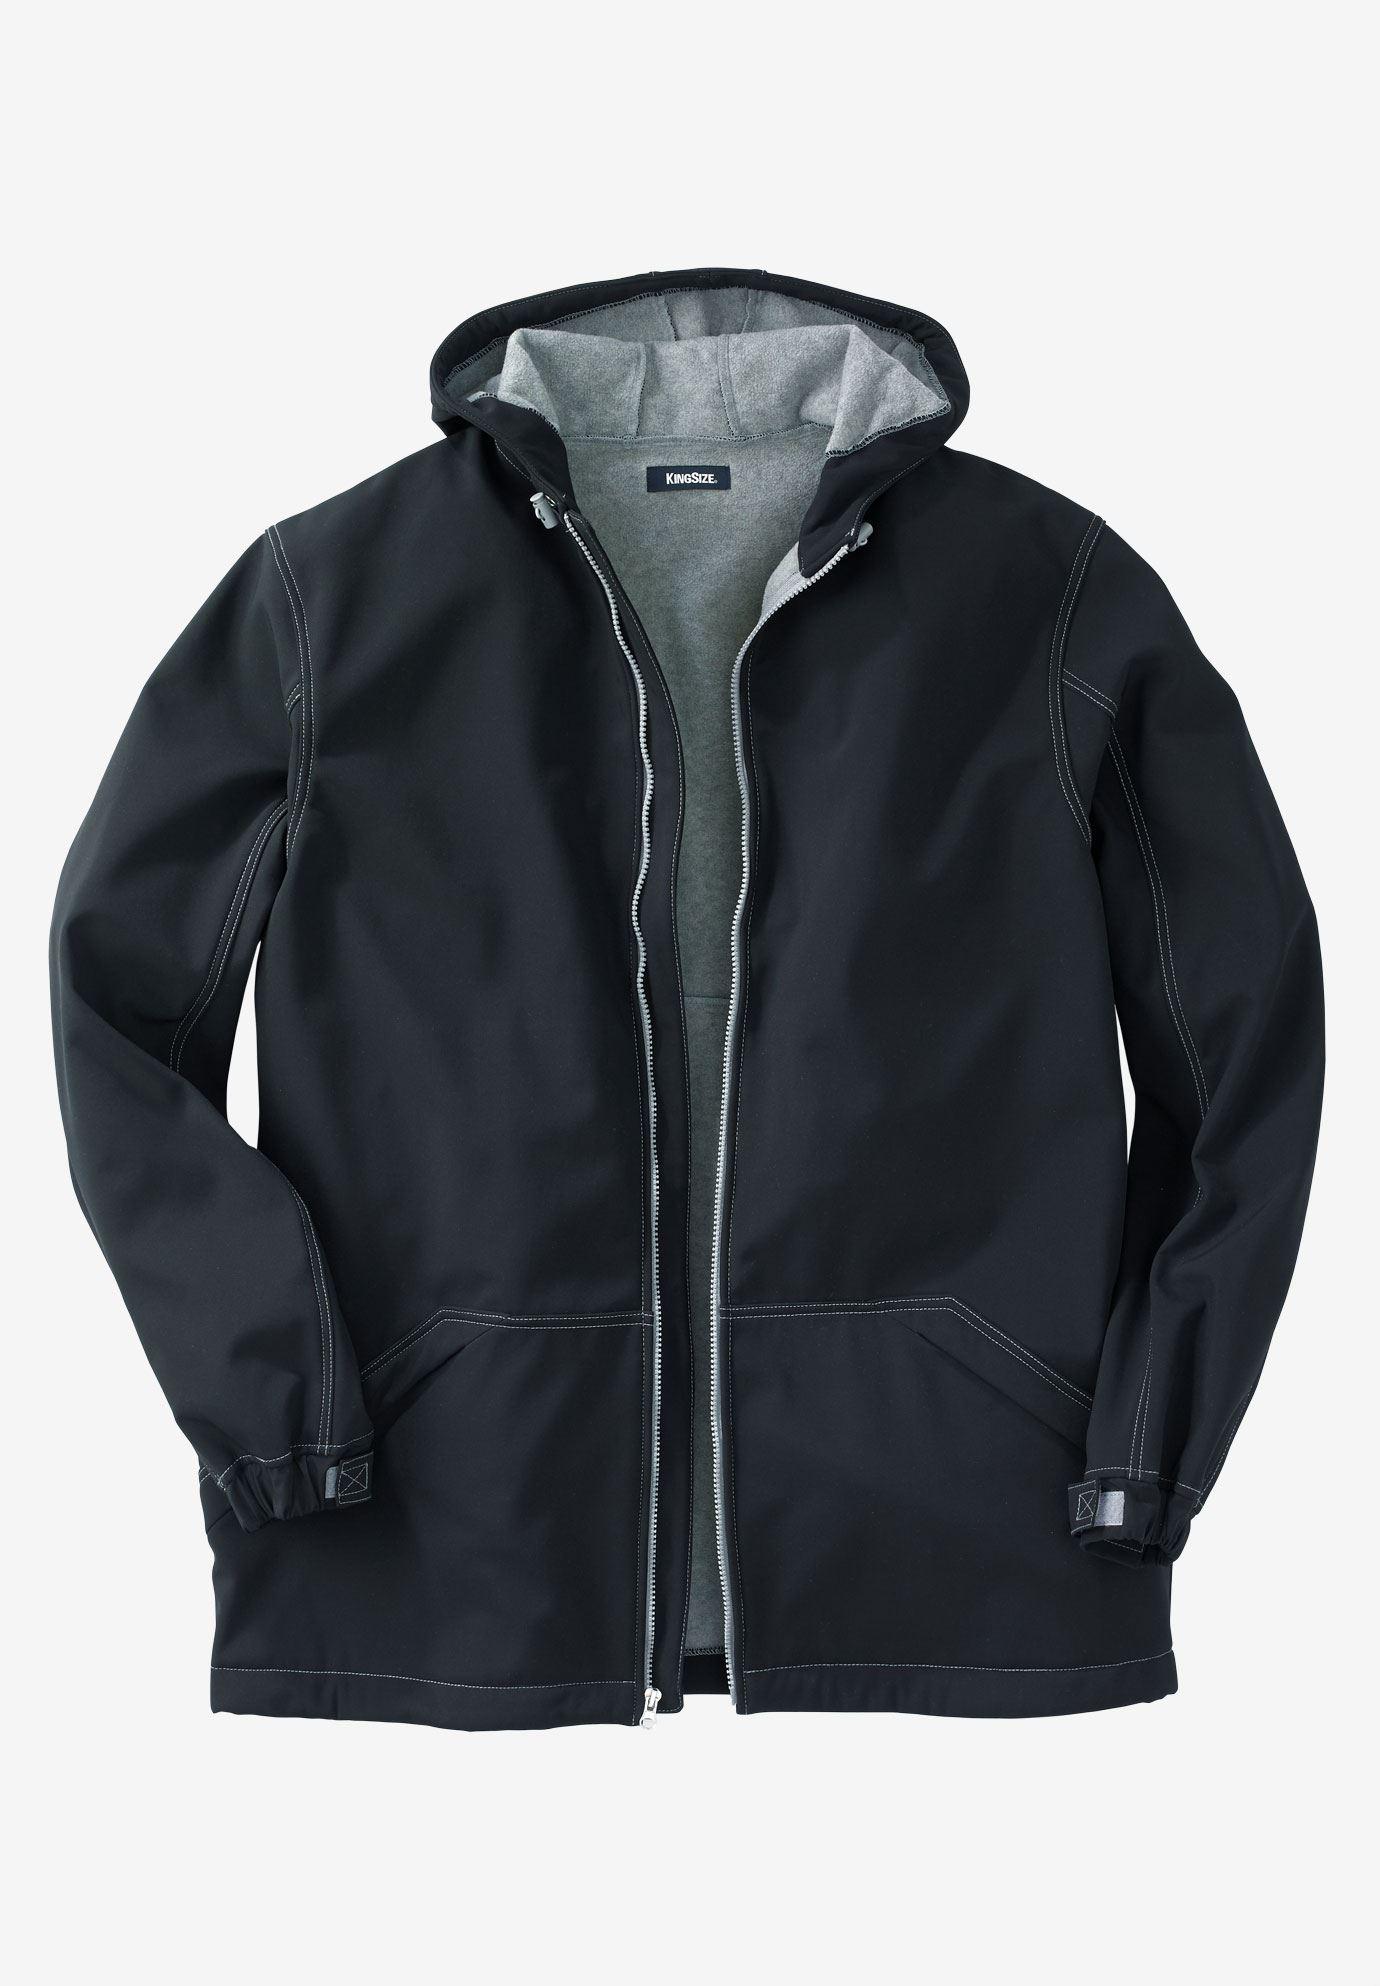 Fleece Lined Rain Coat Big And Tall Coats Amp Parkas King